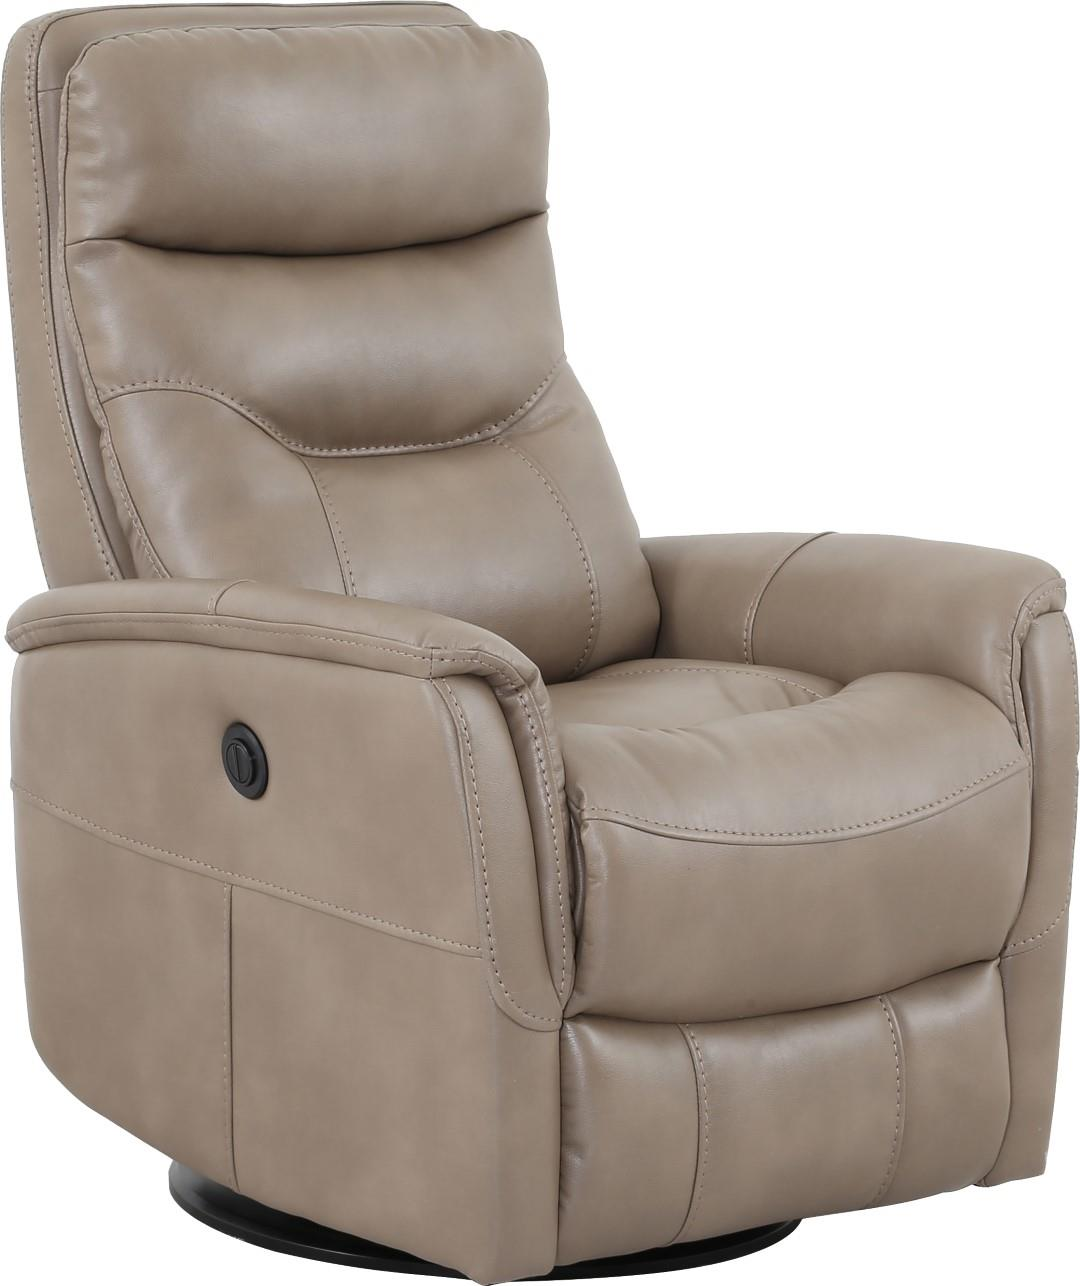 Power Ergo Recliner W Adjustable Headrest Taupe